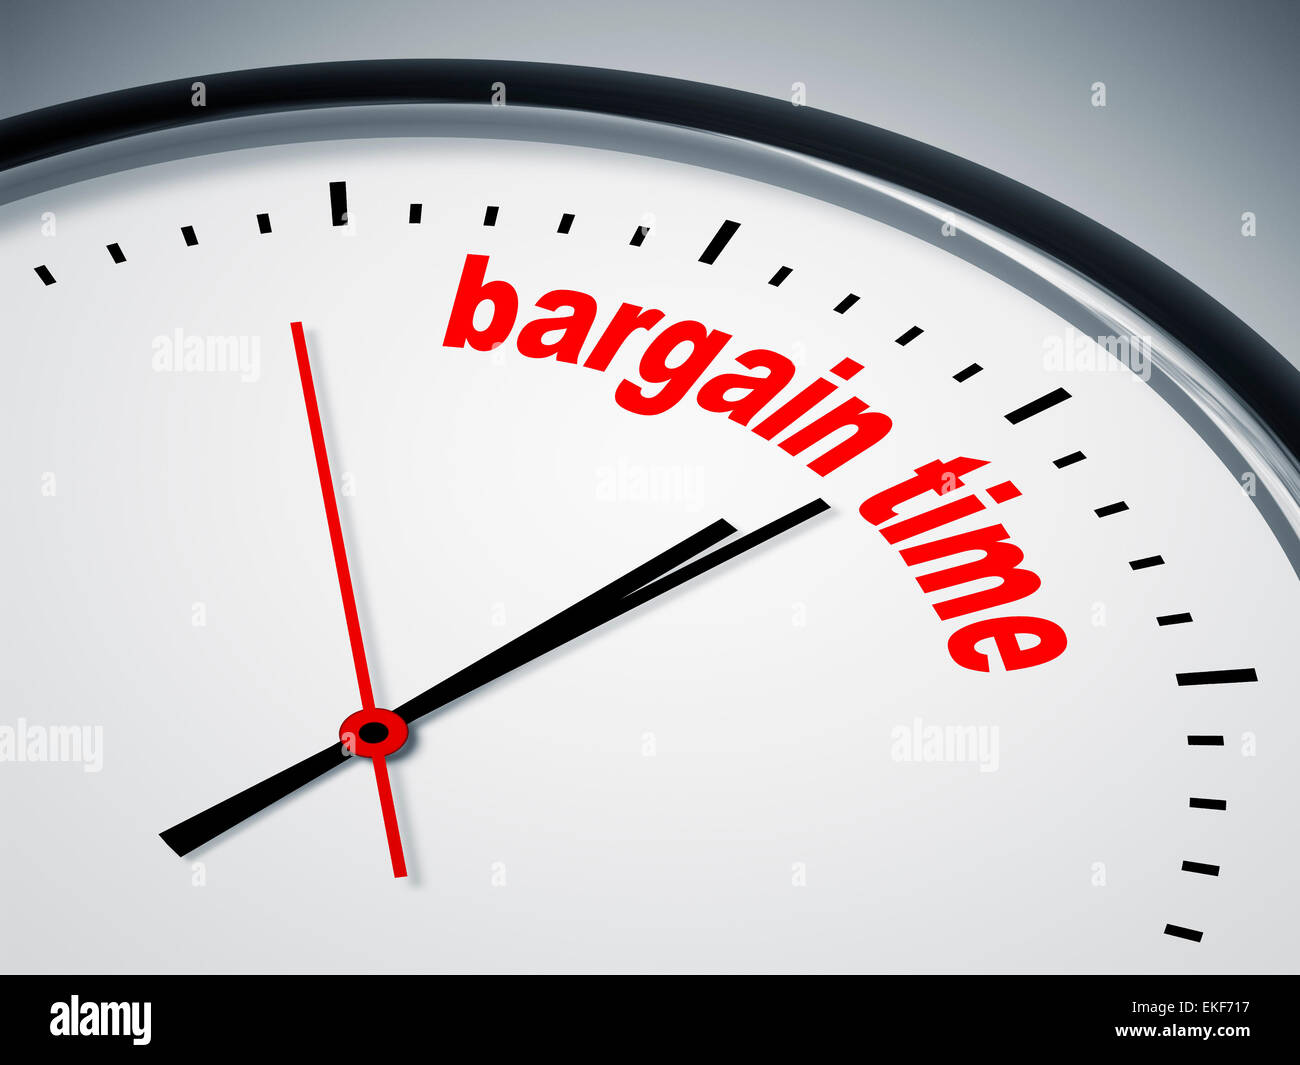 bargain time - Stock Image